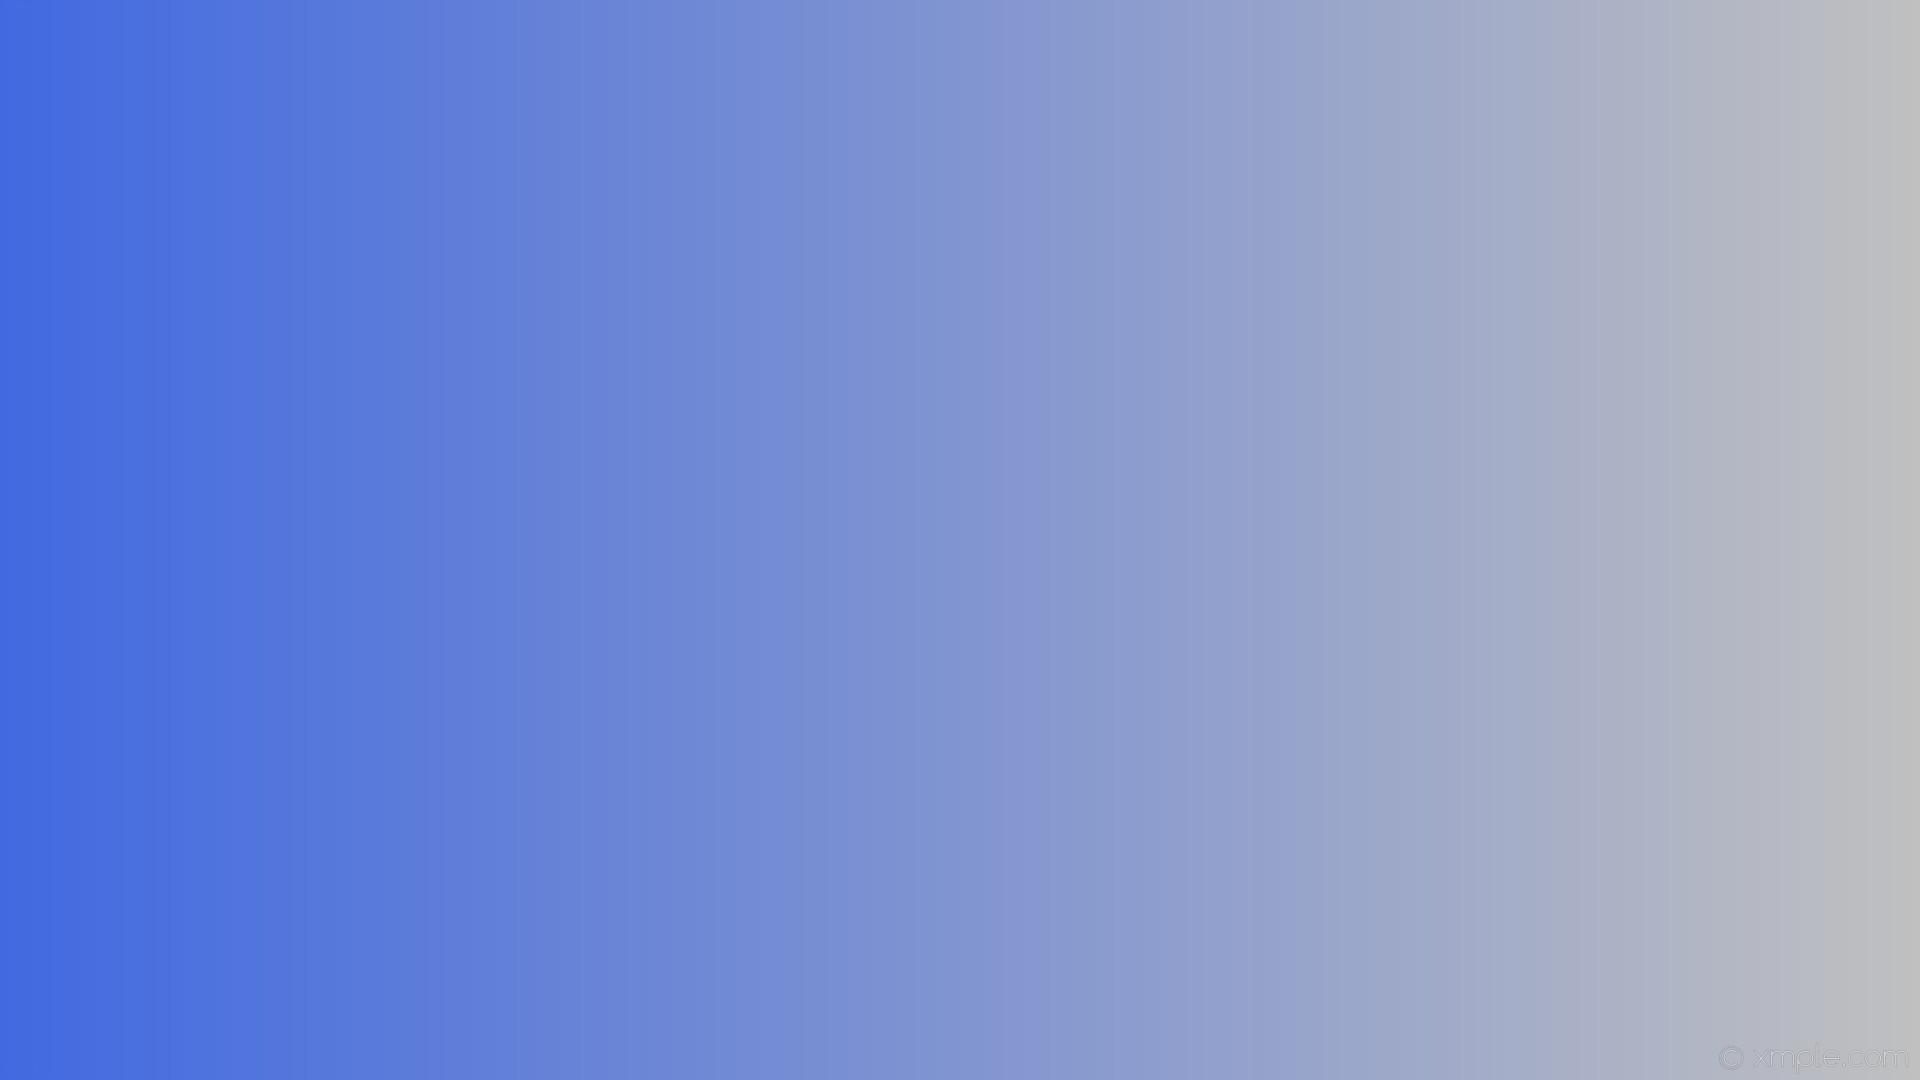 wallpaper linear gradient grey blue royal blue silver #4169e1 #c0c0c0 180°